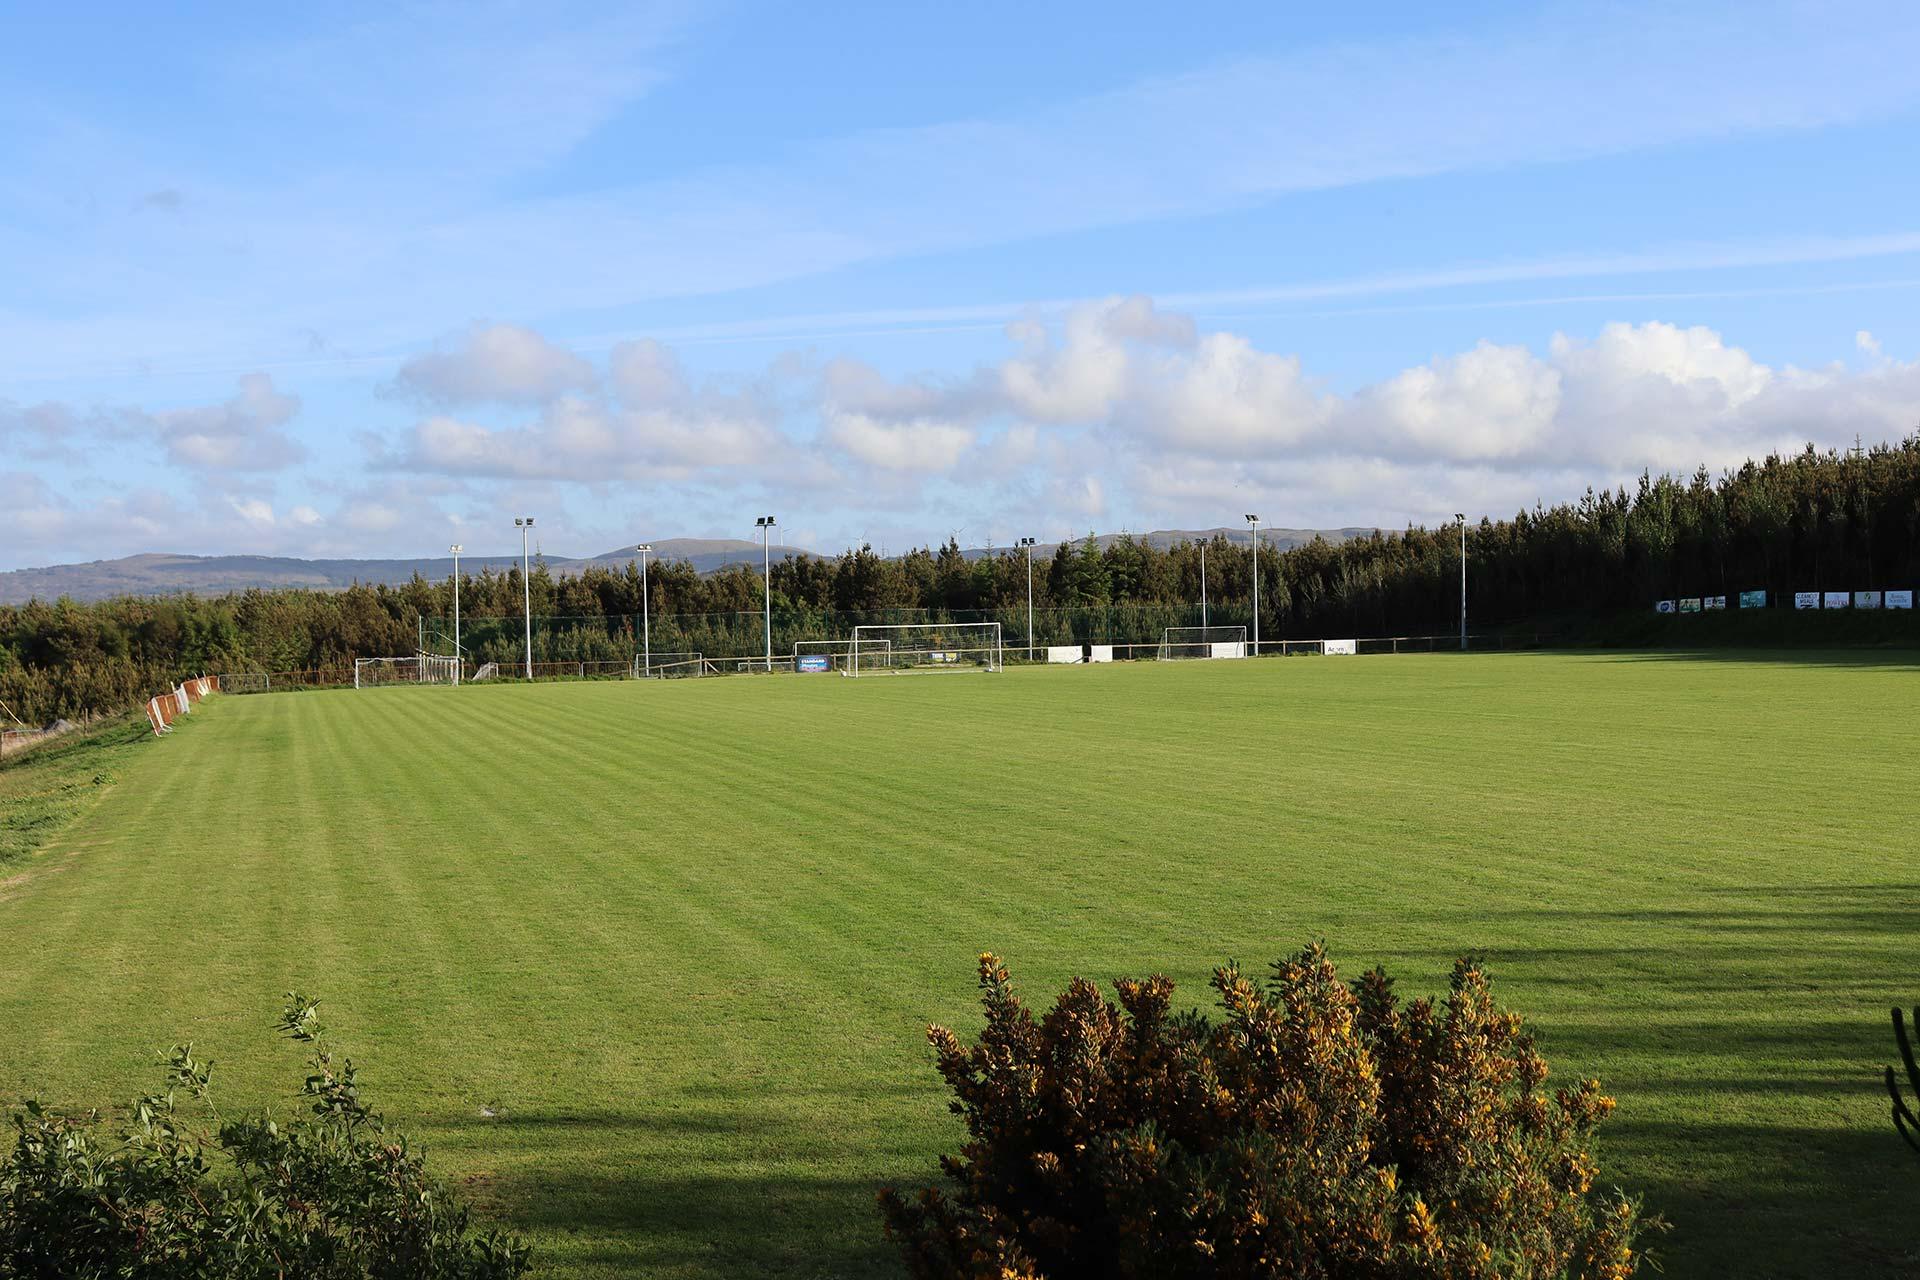 Newvillage-Football-Park-(2)